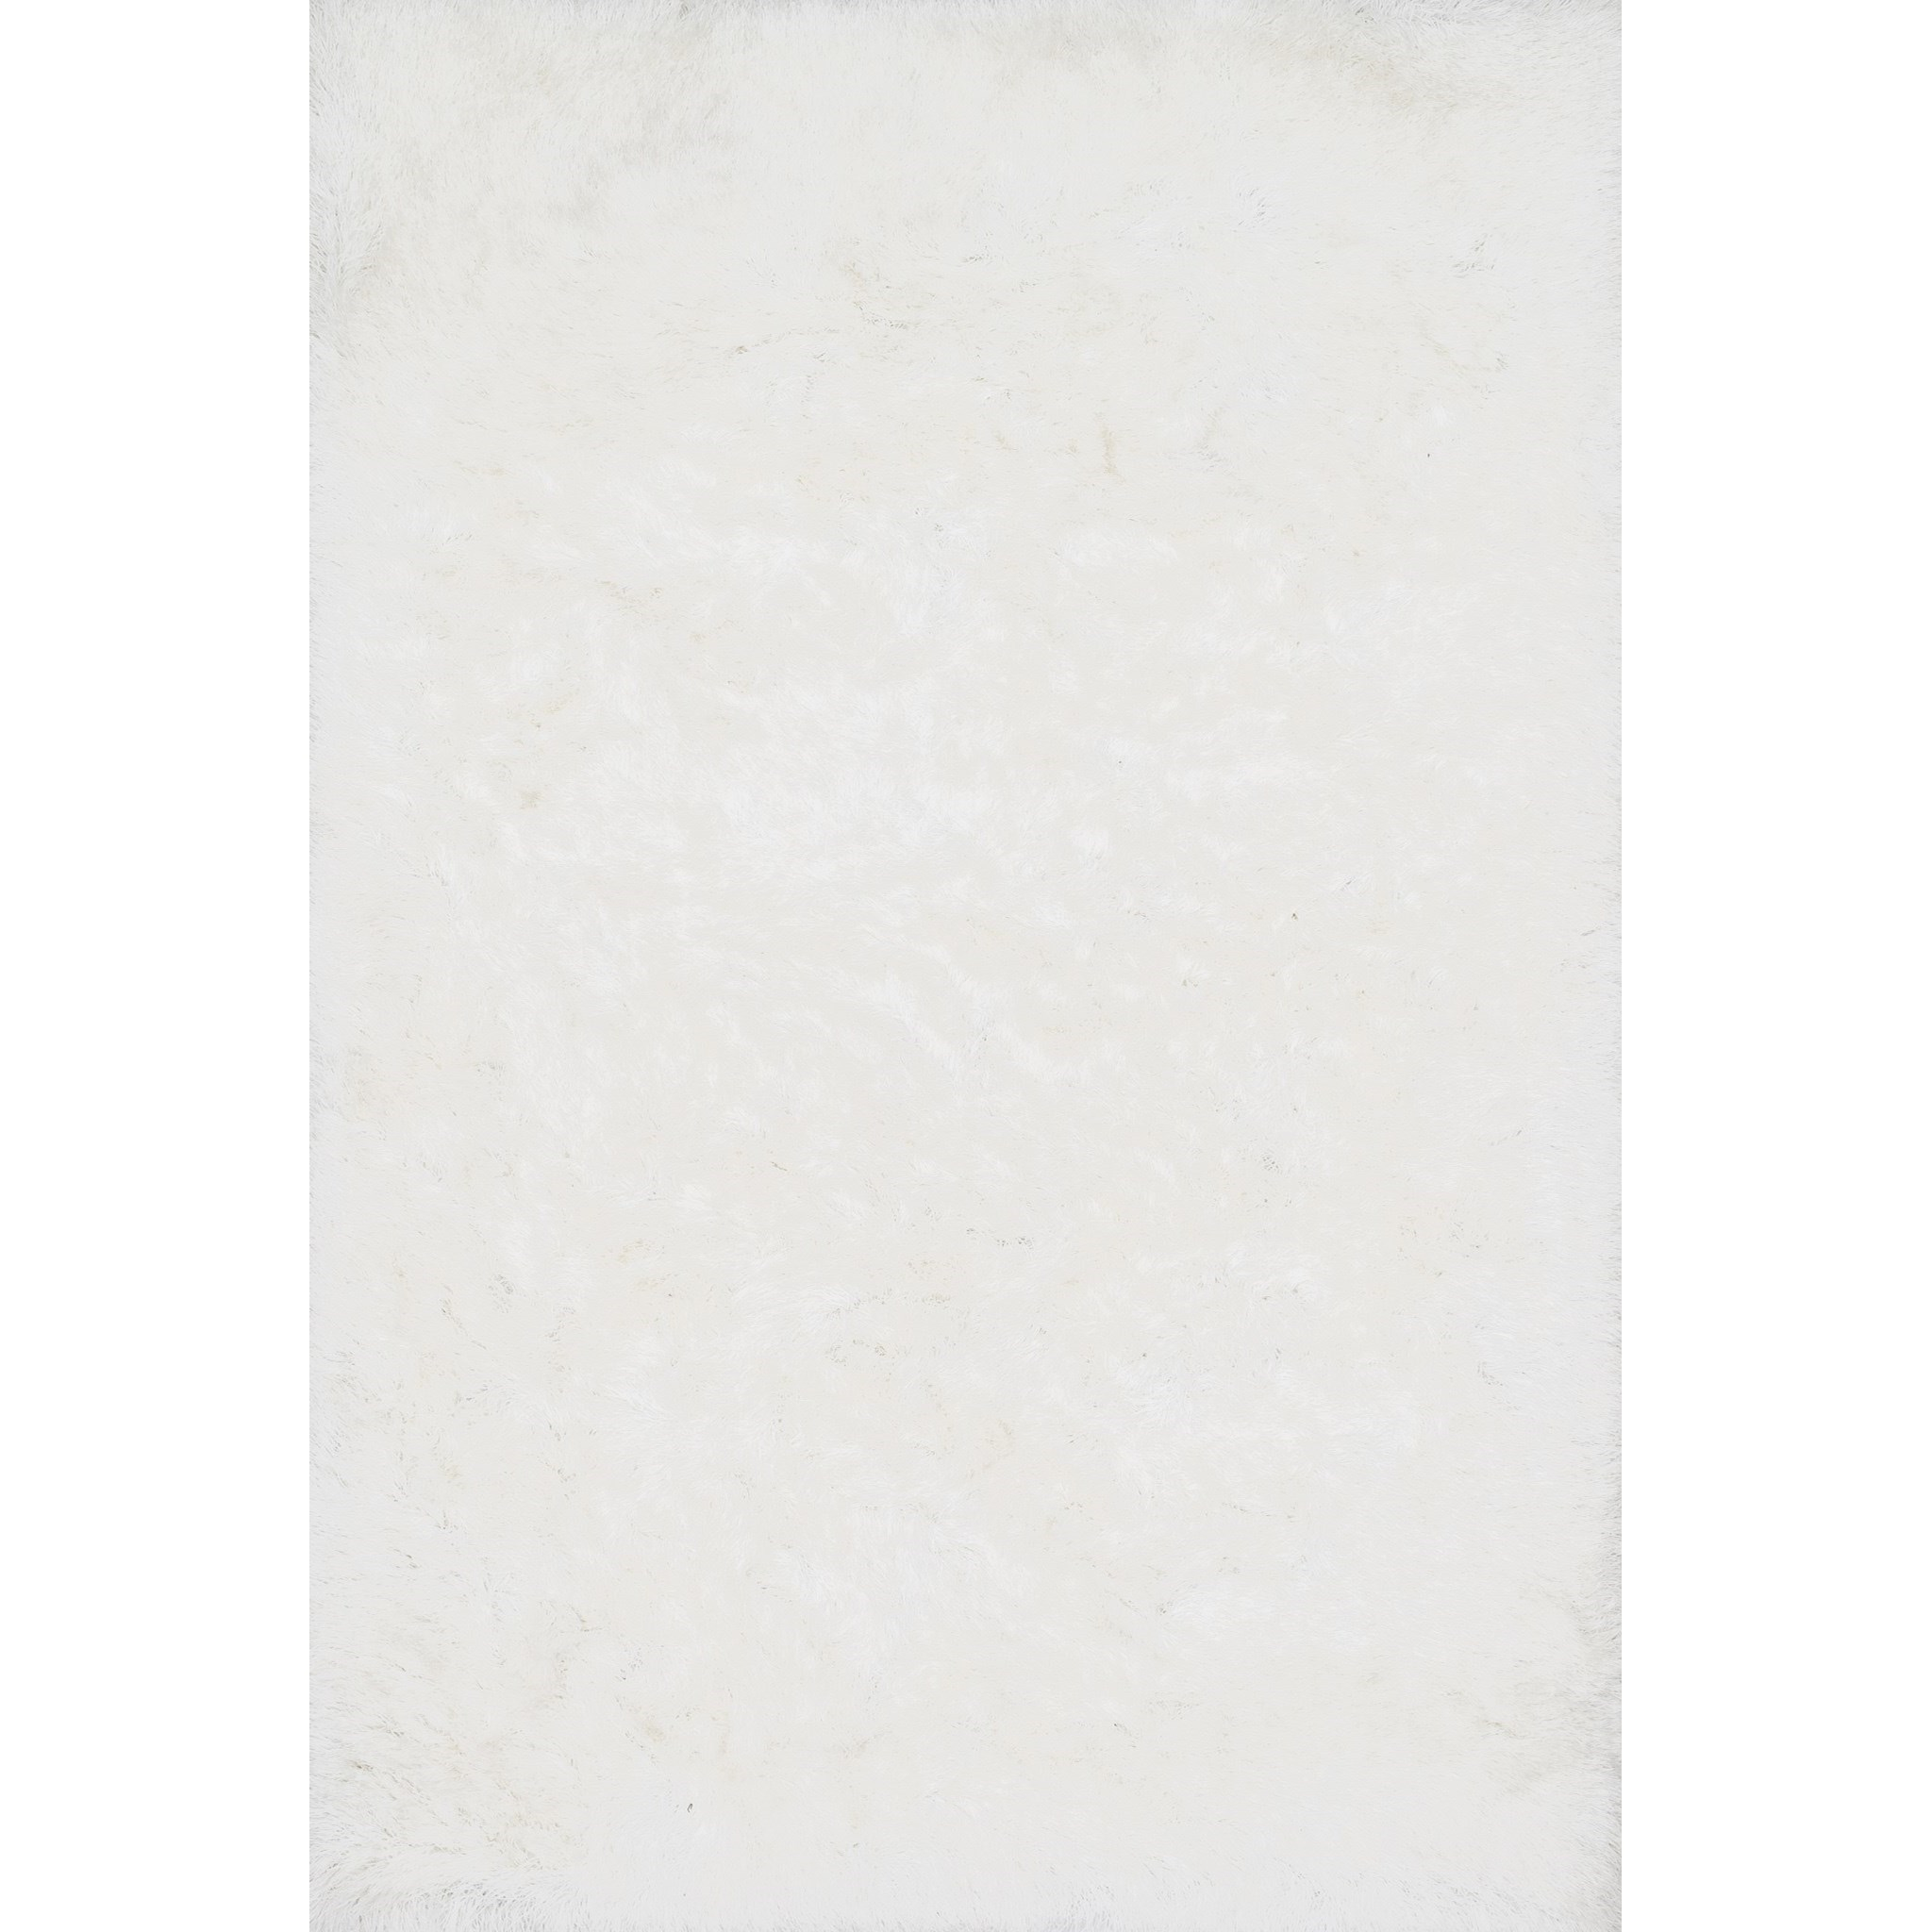 "Orian Shag 7'-9"" x 9'-9"" Area Rug by Loloi Rugs at Virginia Furniture Market"